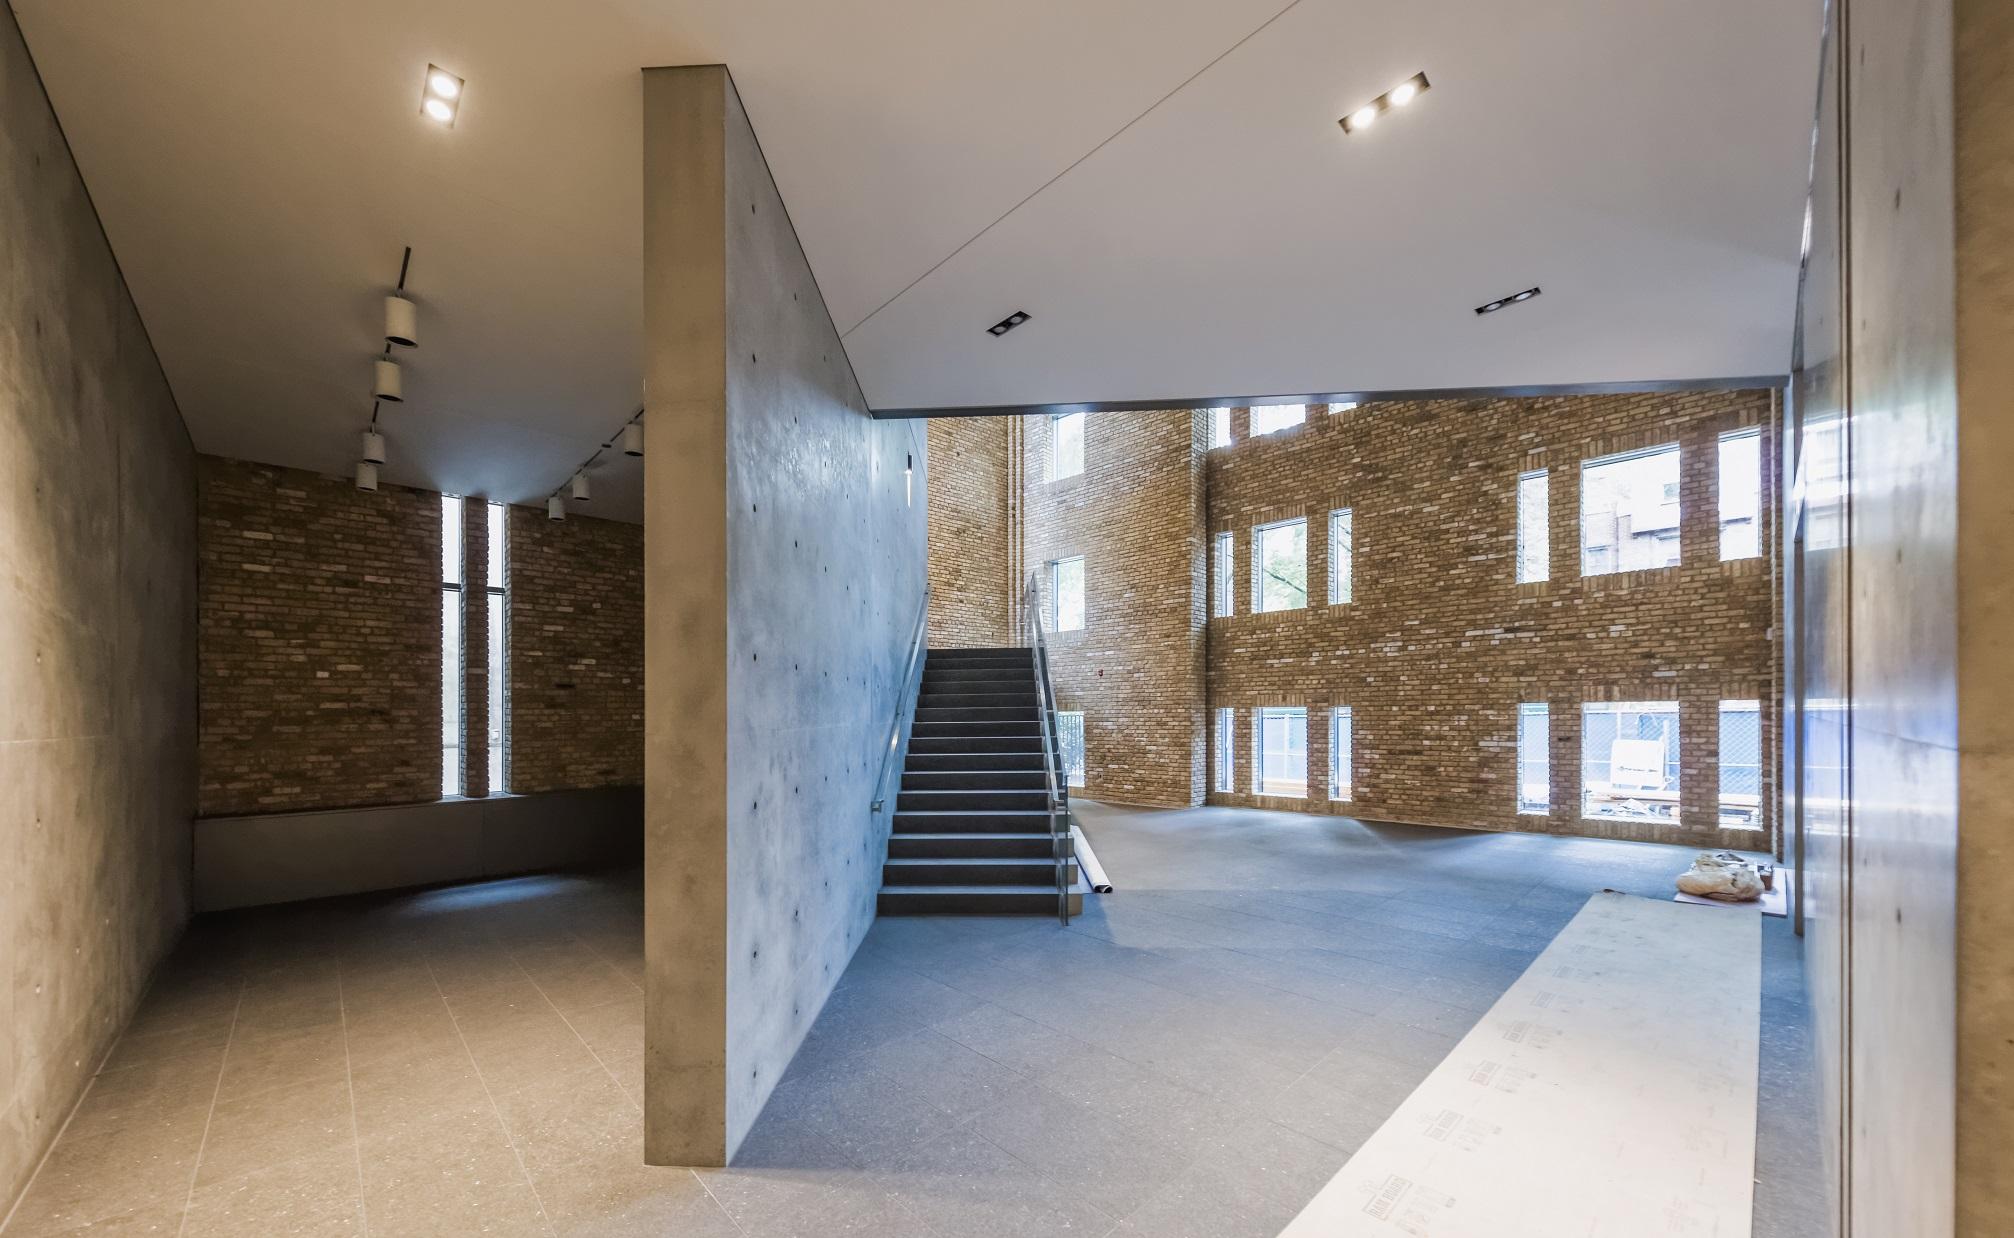 First floor of Wrightwood 659. Photo credit Jeff Goldberg-Esto